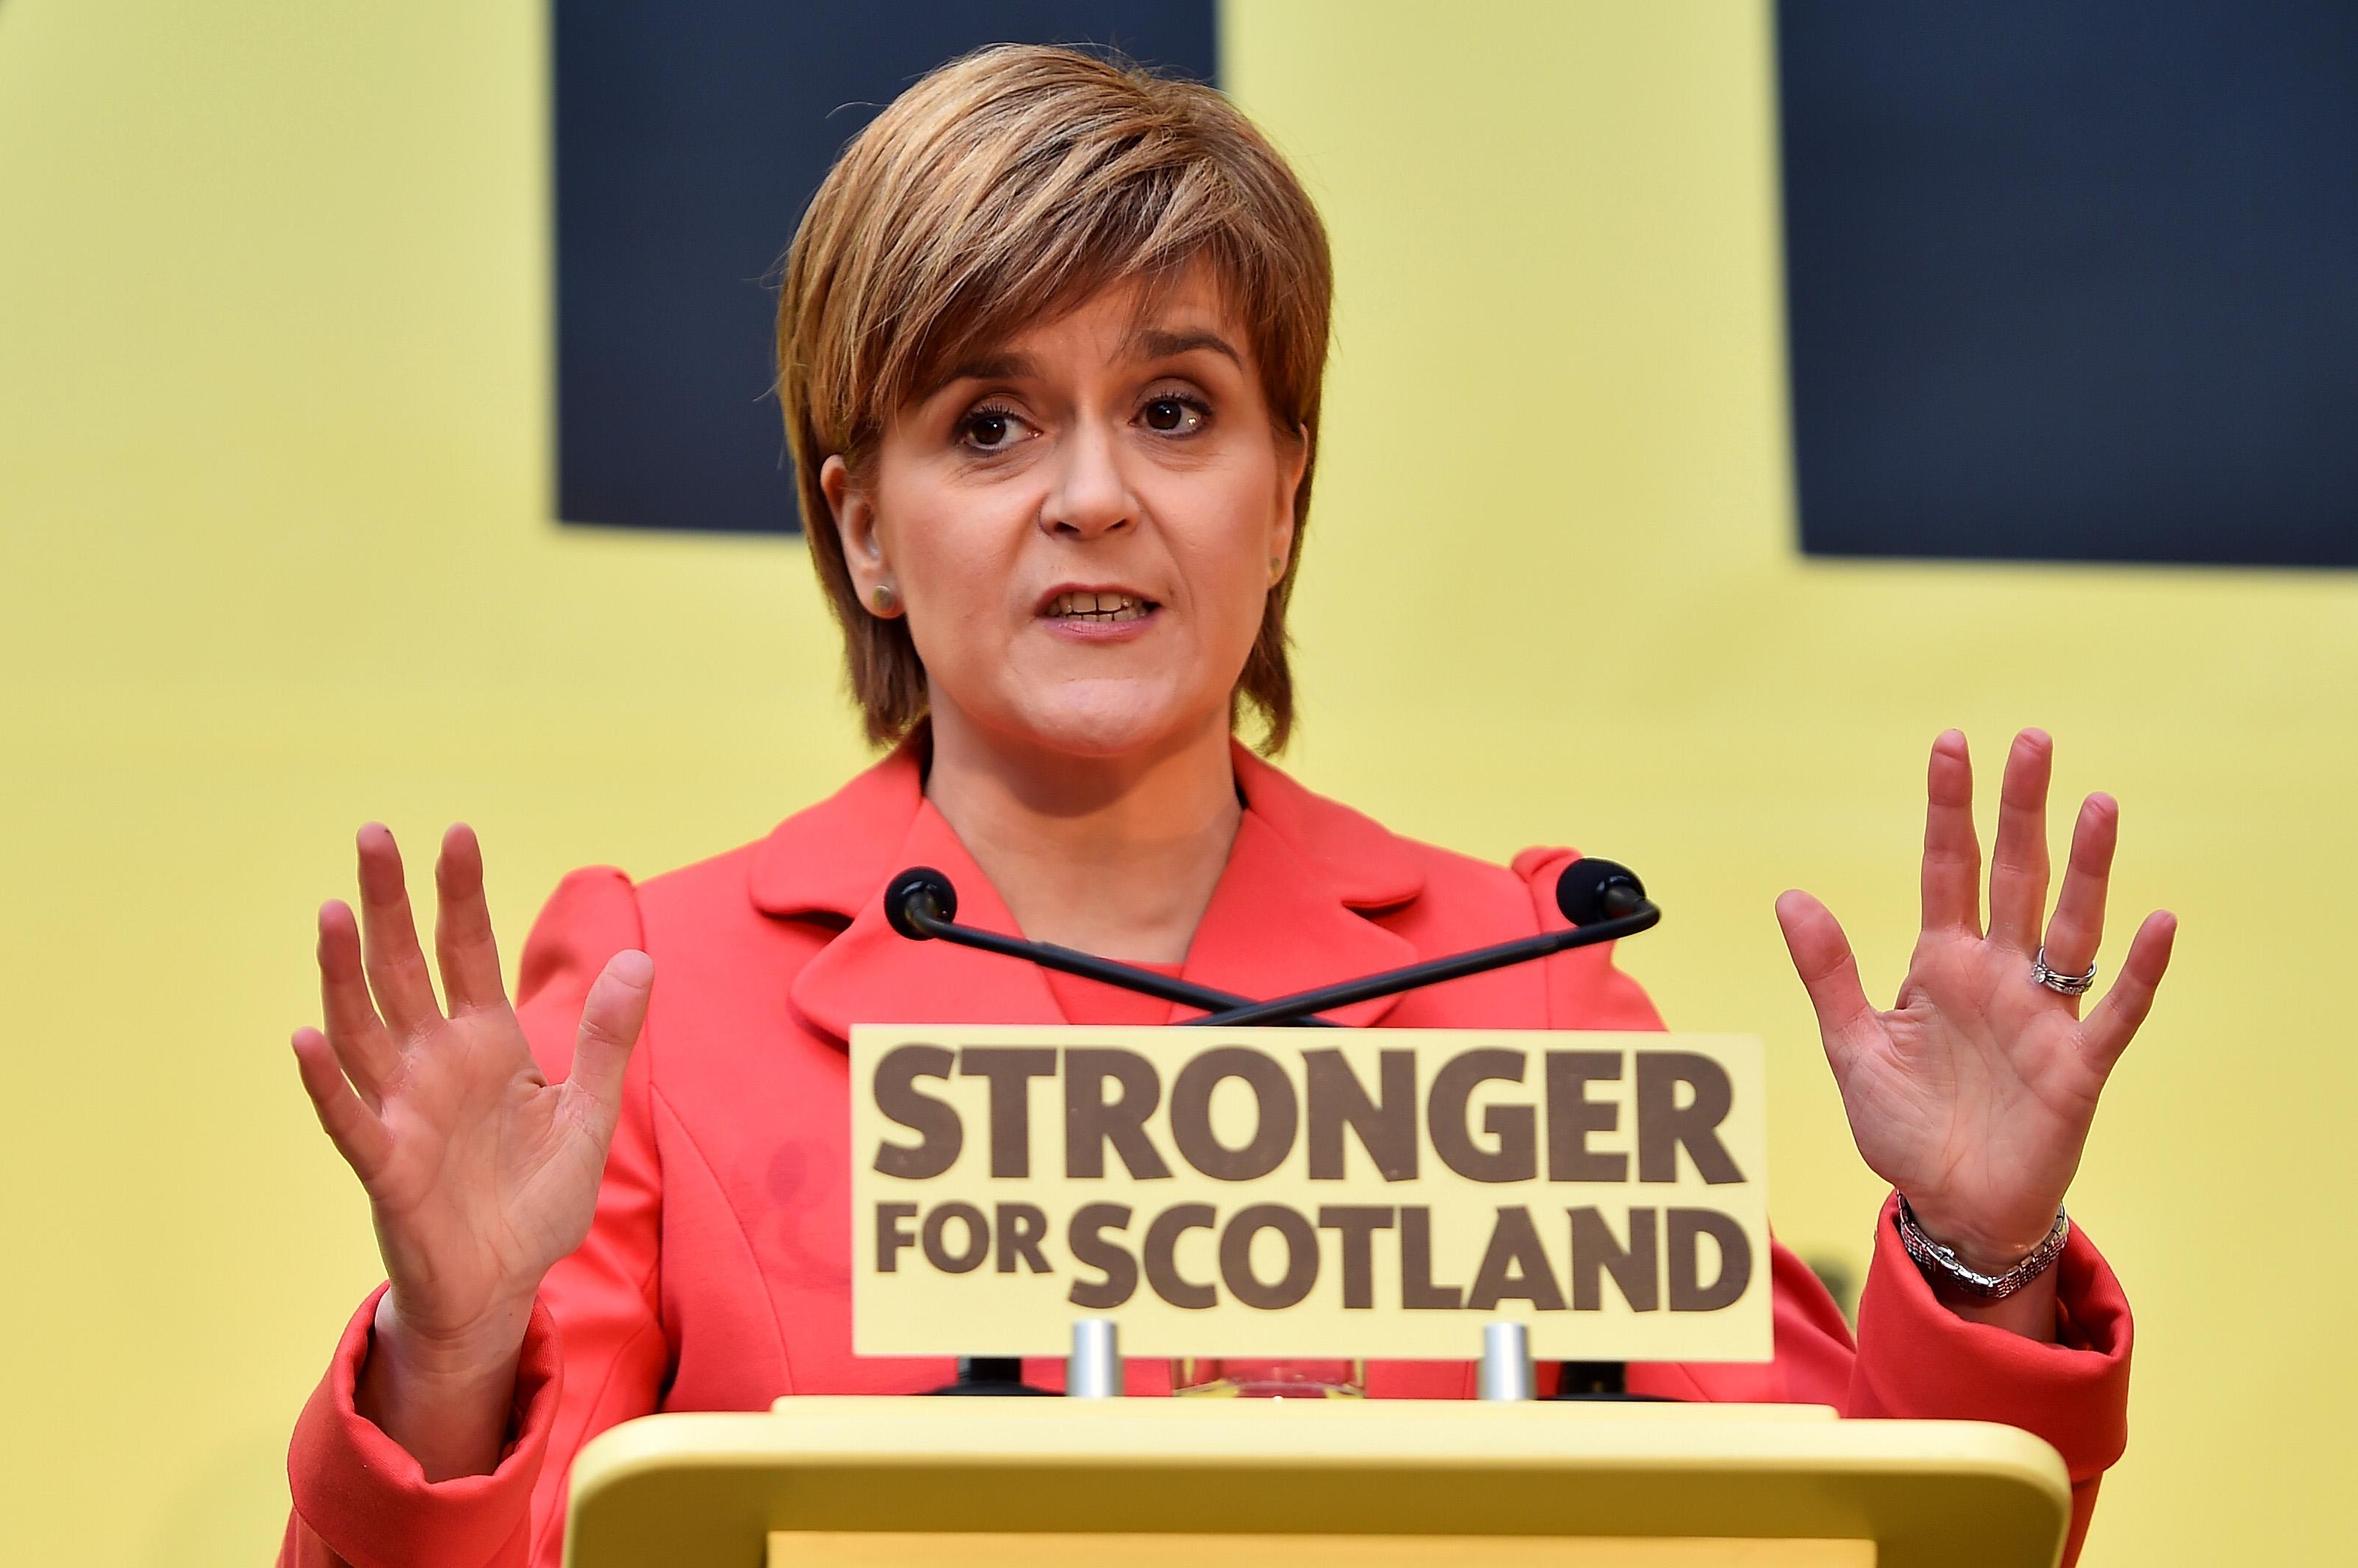 SNP leader Nicola Sturgeon launches the Scottish National Party manifesto at the Edinburgh International Climbing Arena, EICA Ratho, on April 20, 2015 in Edinburgh, Scotland